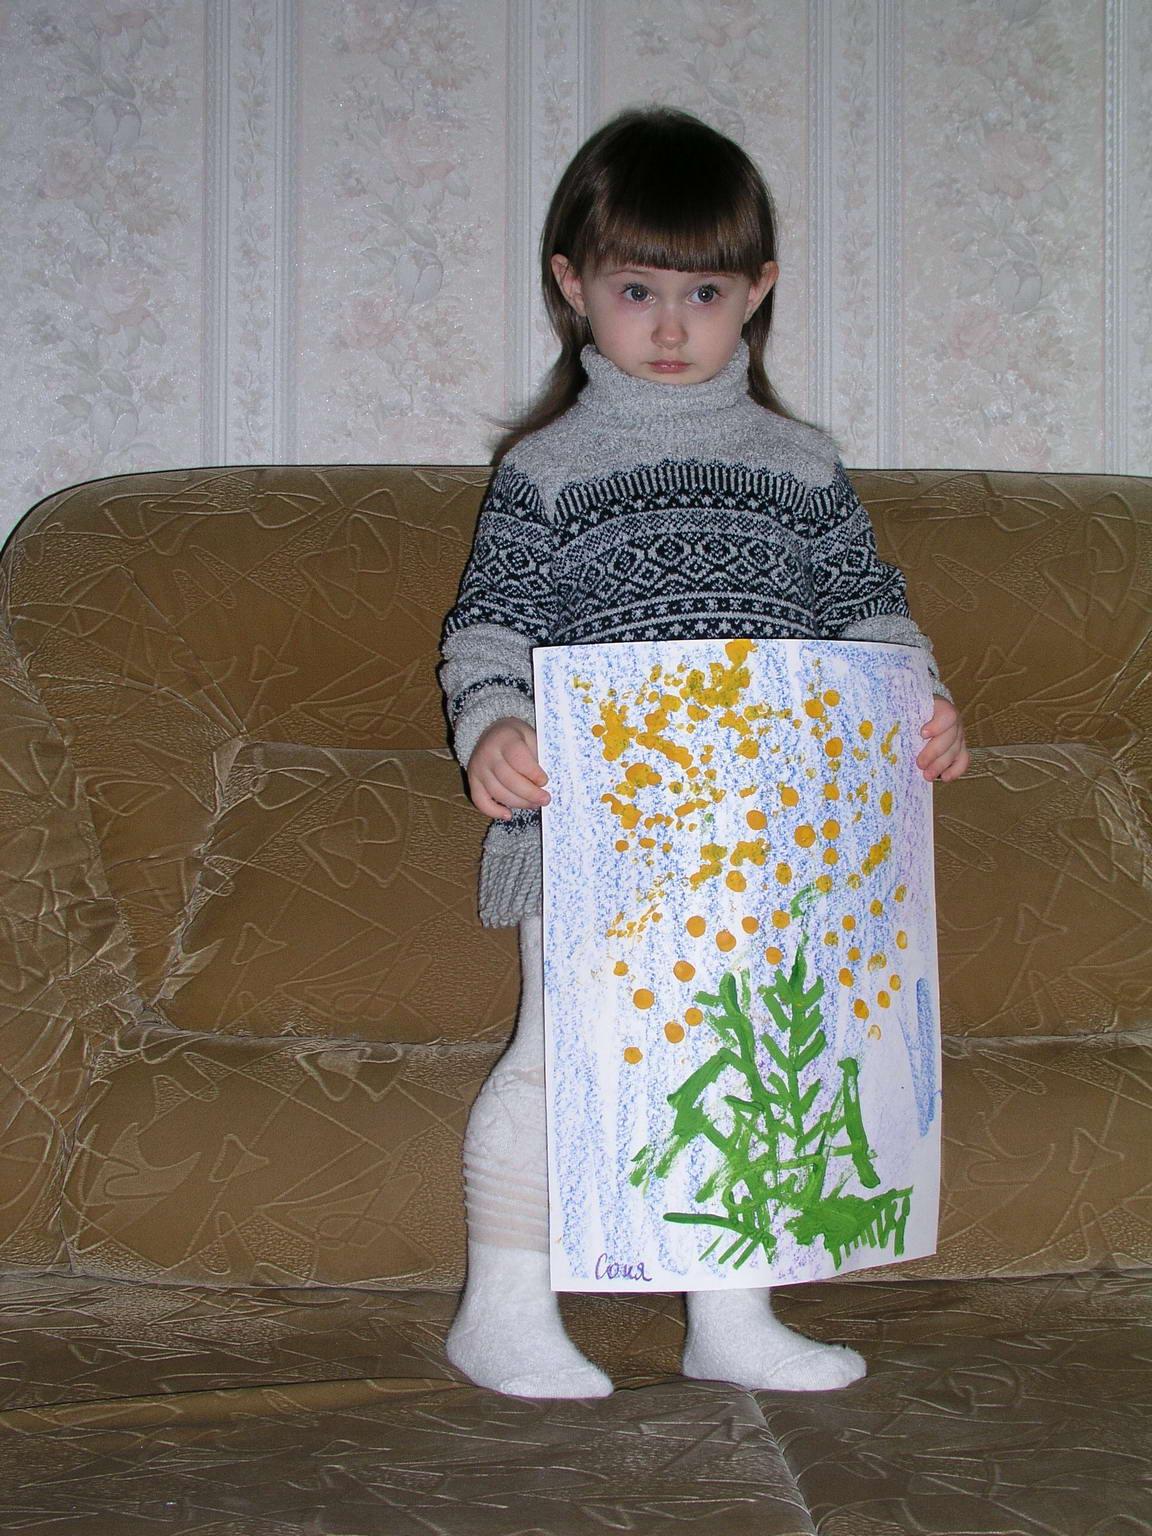 Мимозы для мамы:). Малыши-карандаши